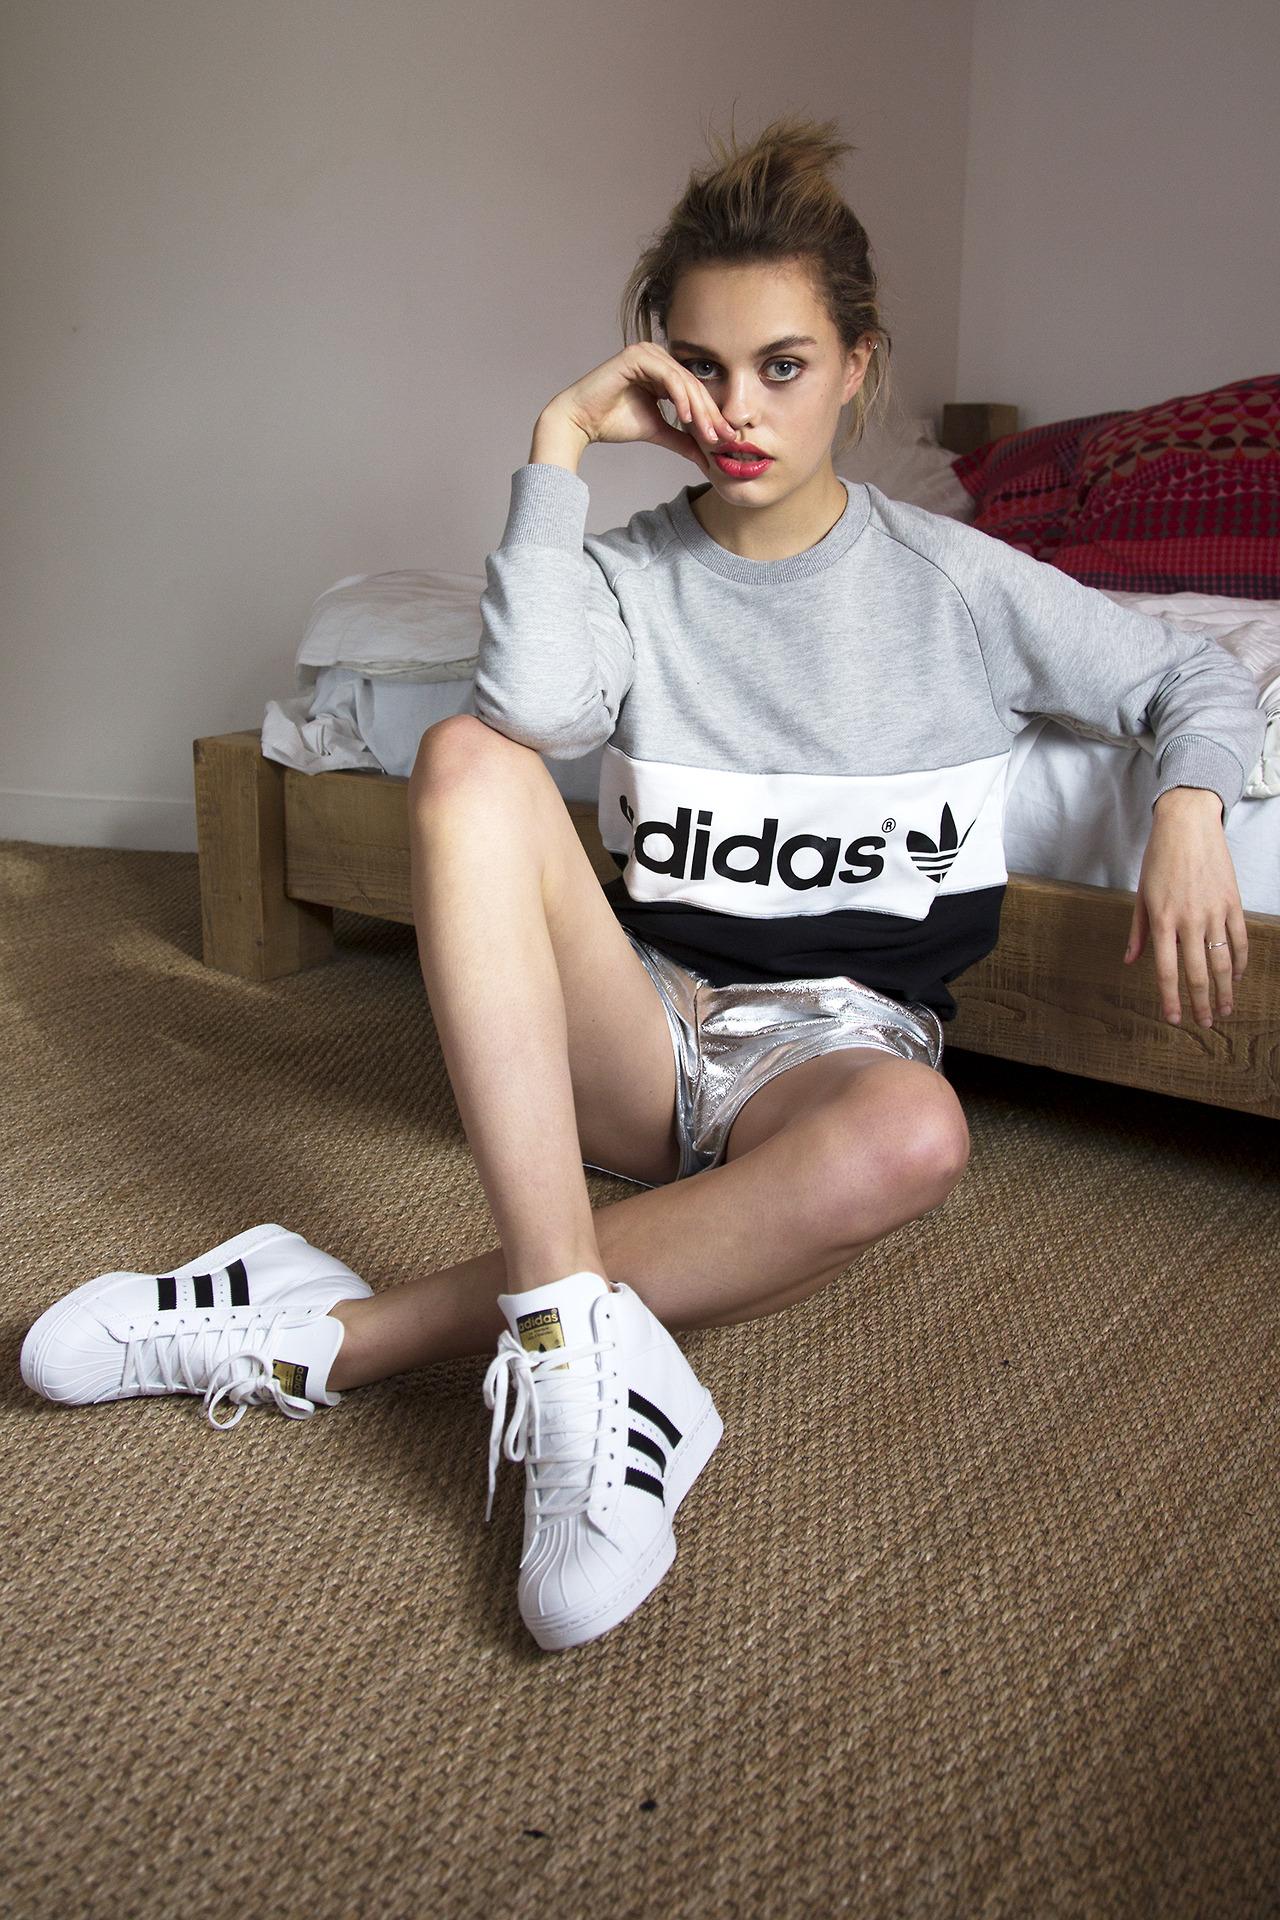 Adidas Superstar Up Høje Superstar Sneakers! Cool Sneakers